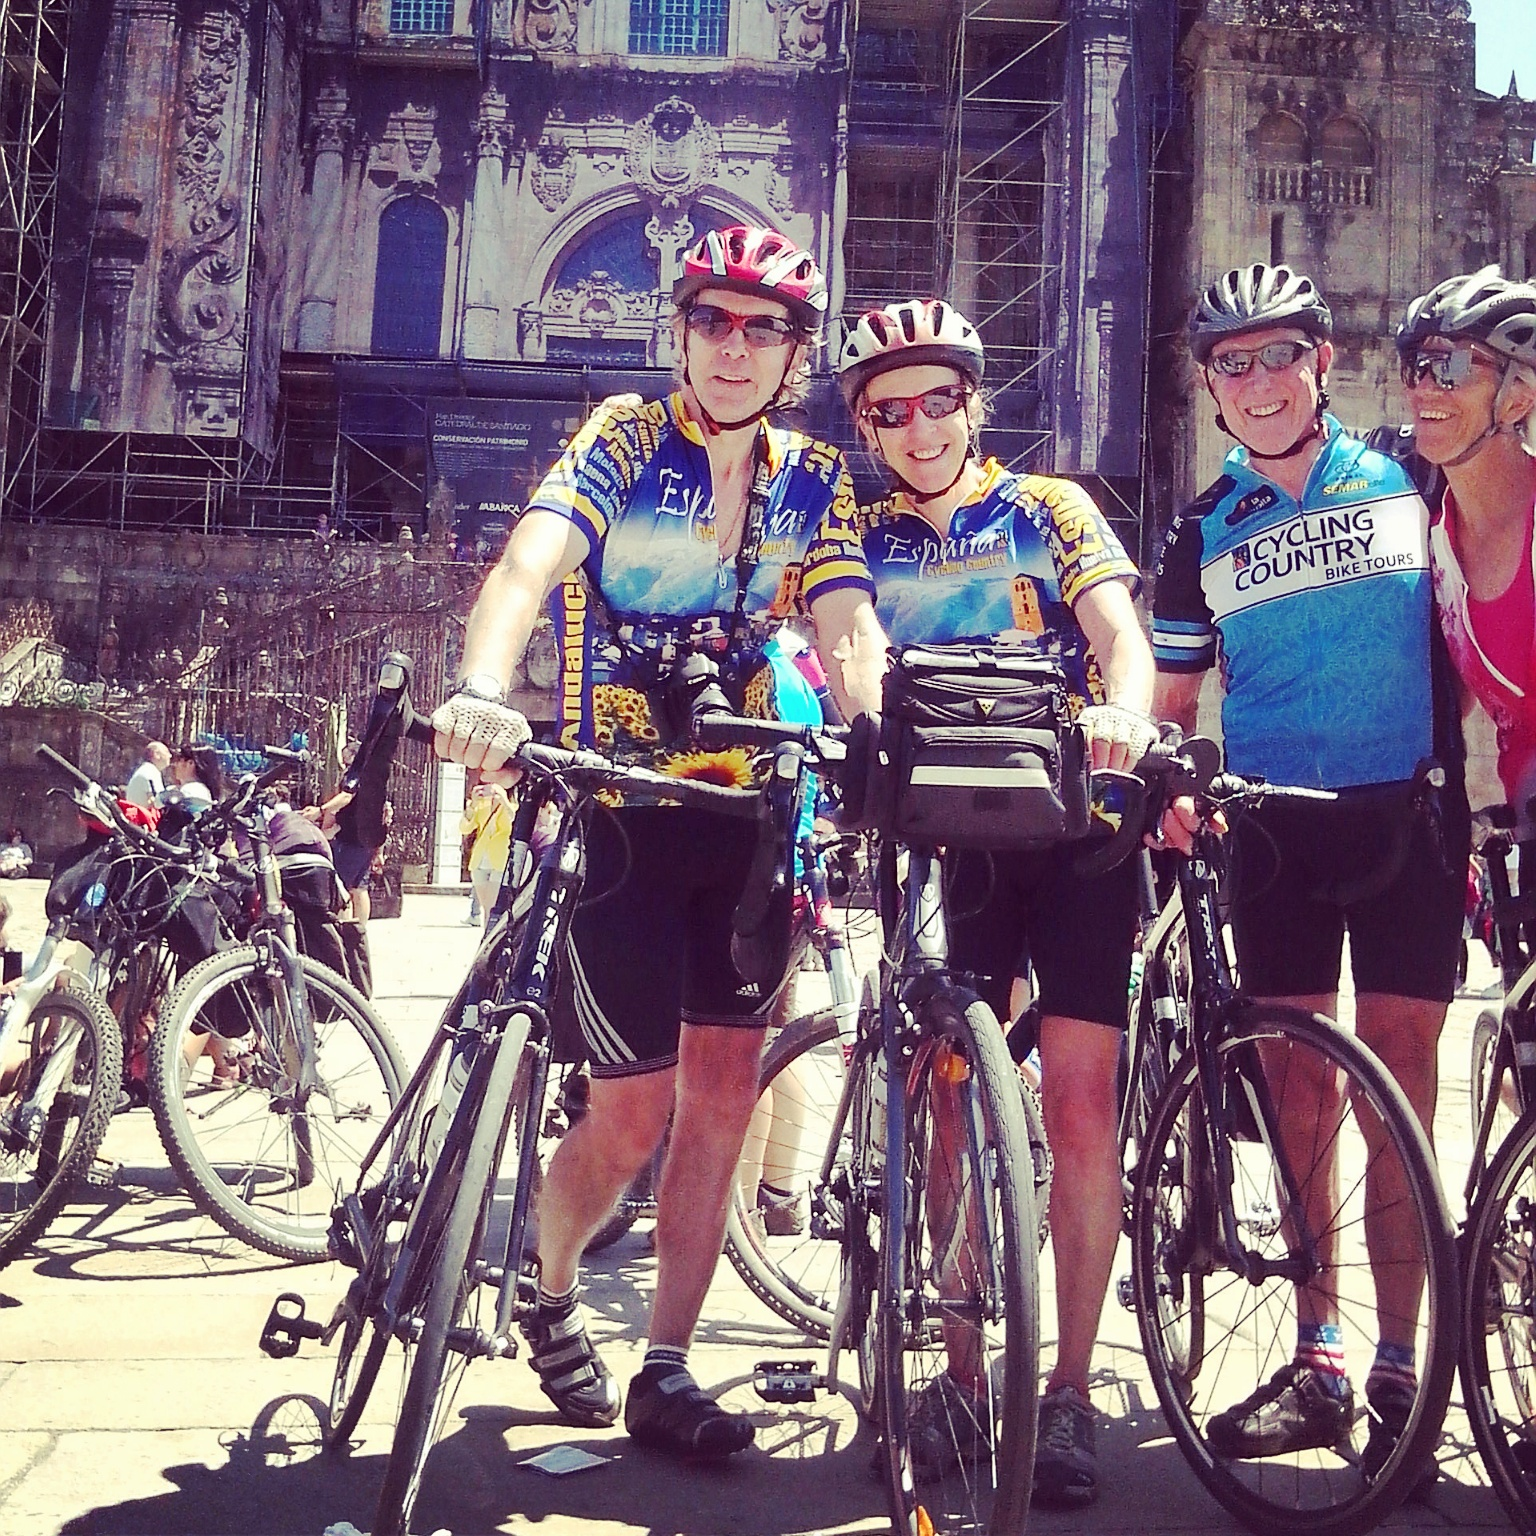 Cycling Country Bike Tours